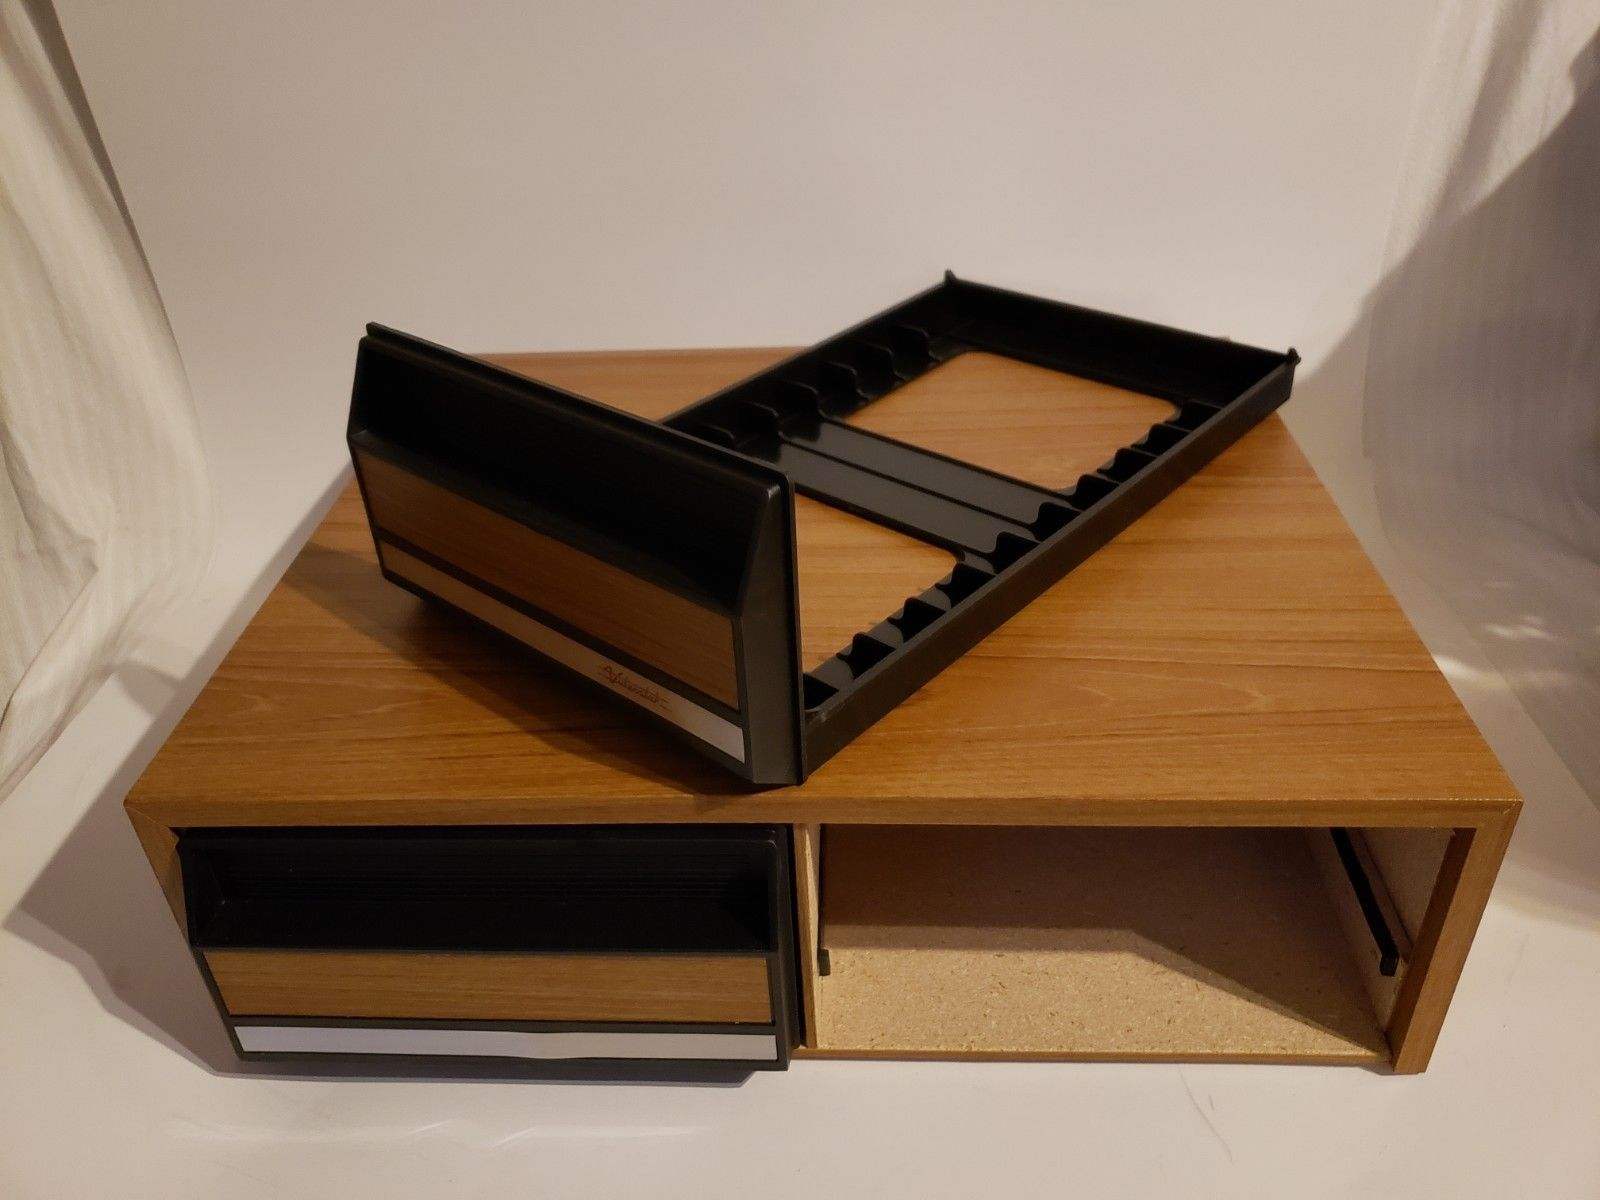 Vintage Videostak Video Cassette Cabinet Holds 24 VHS Tapes..In Original Box image 4